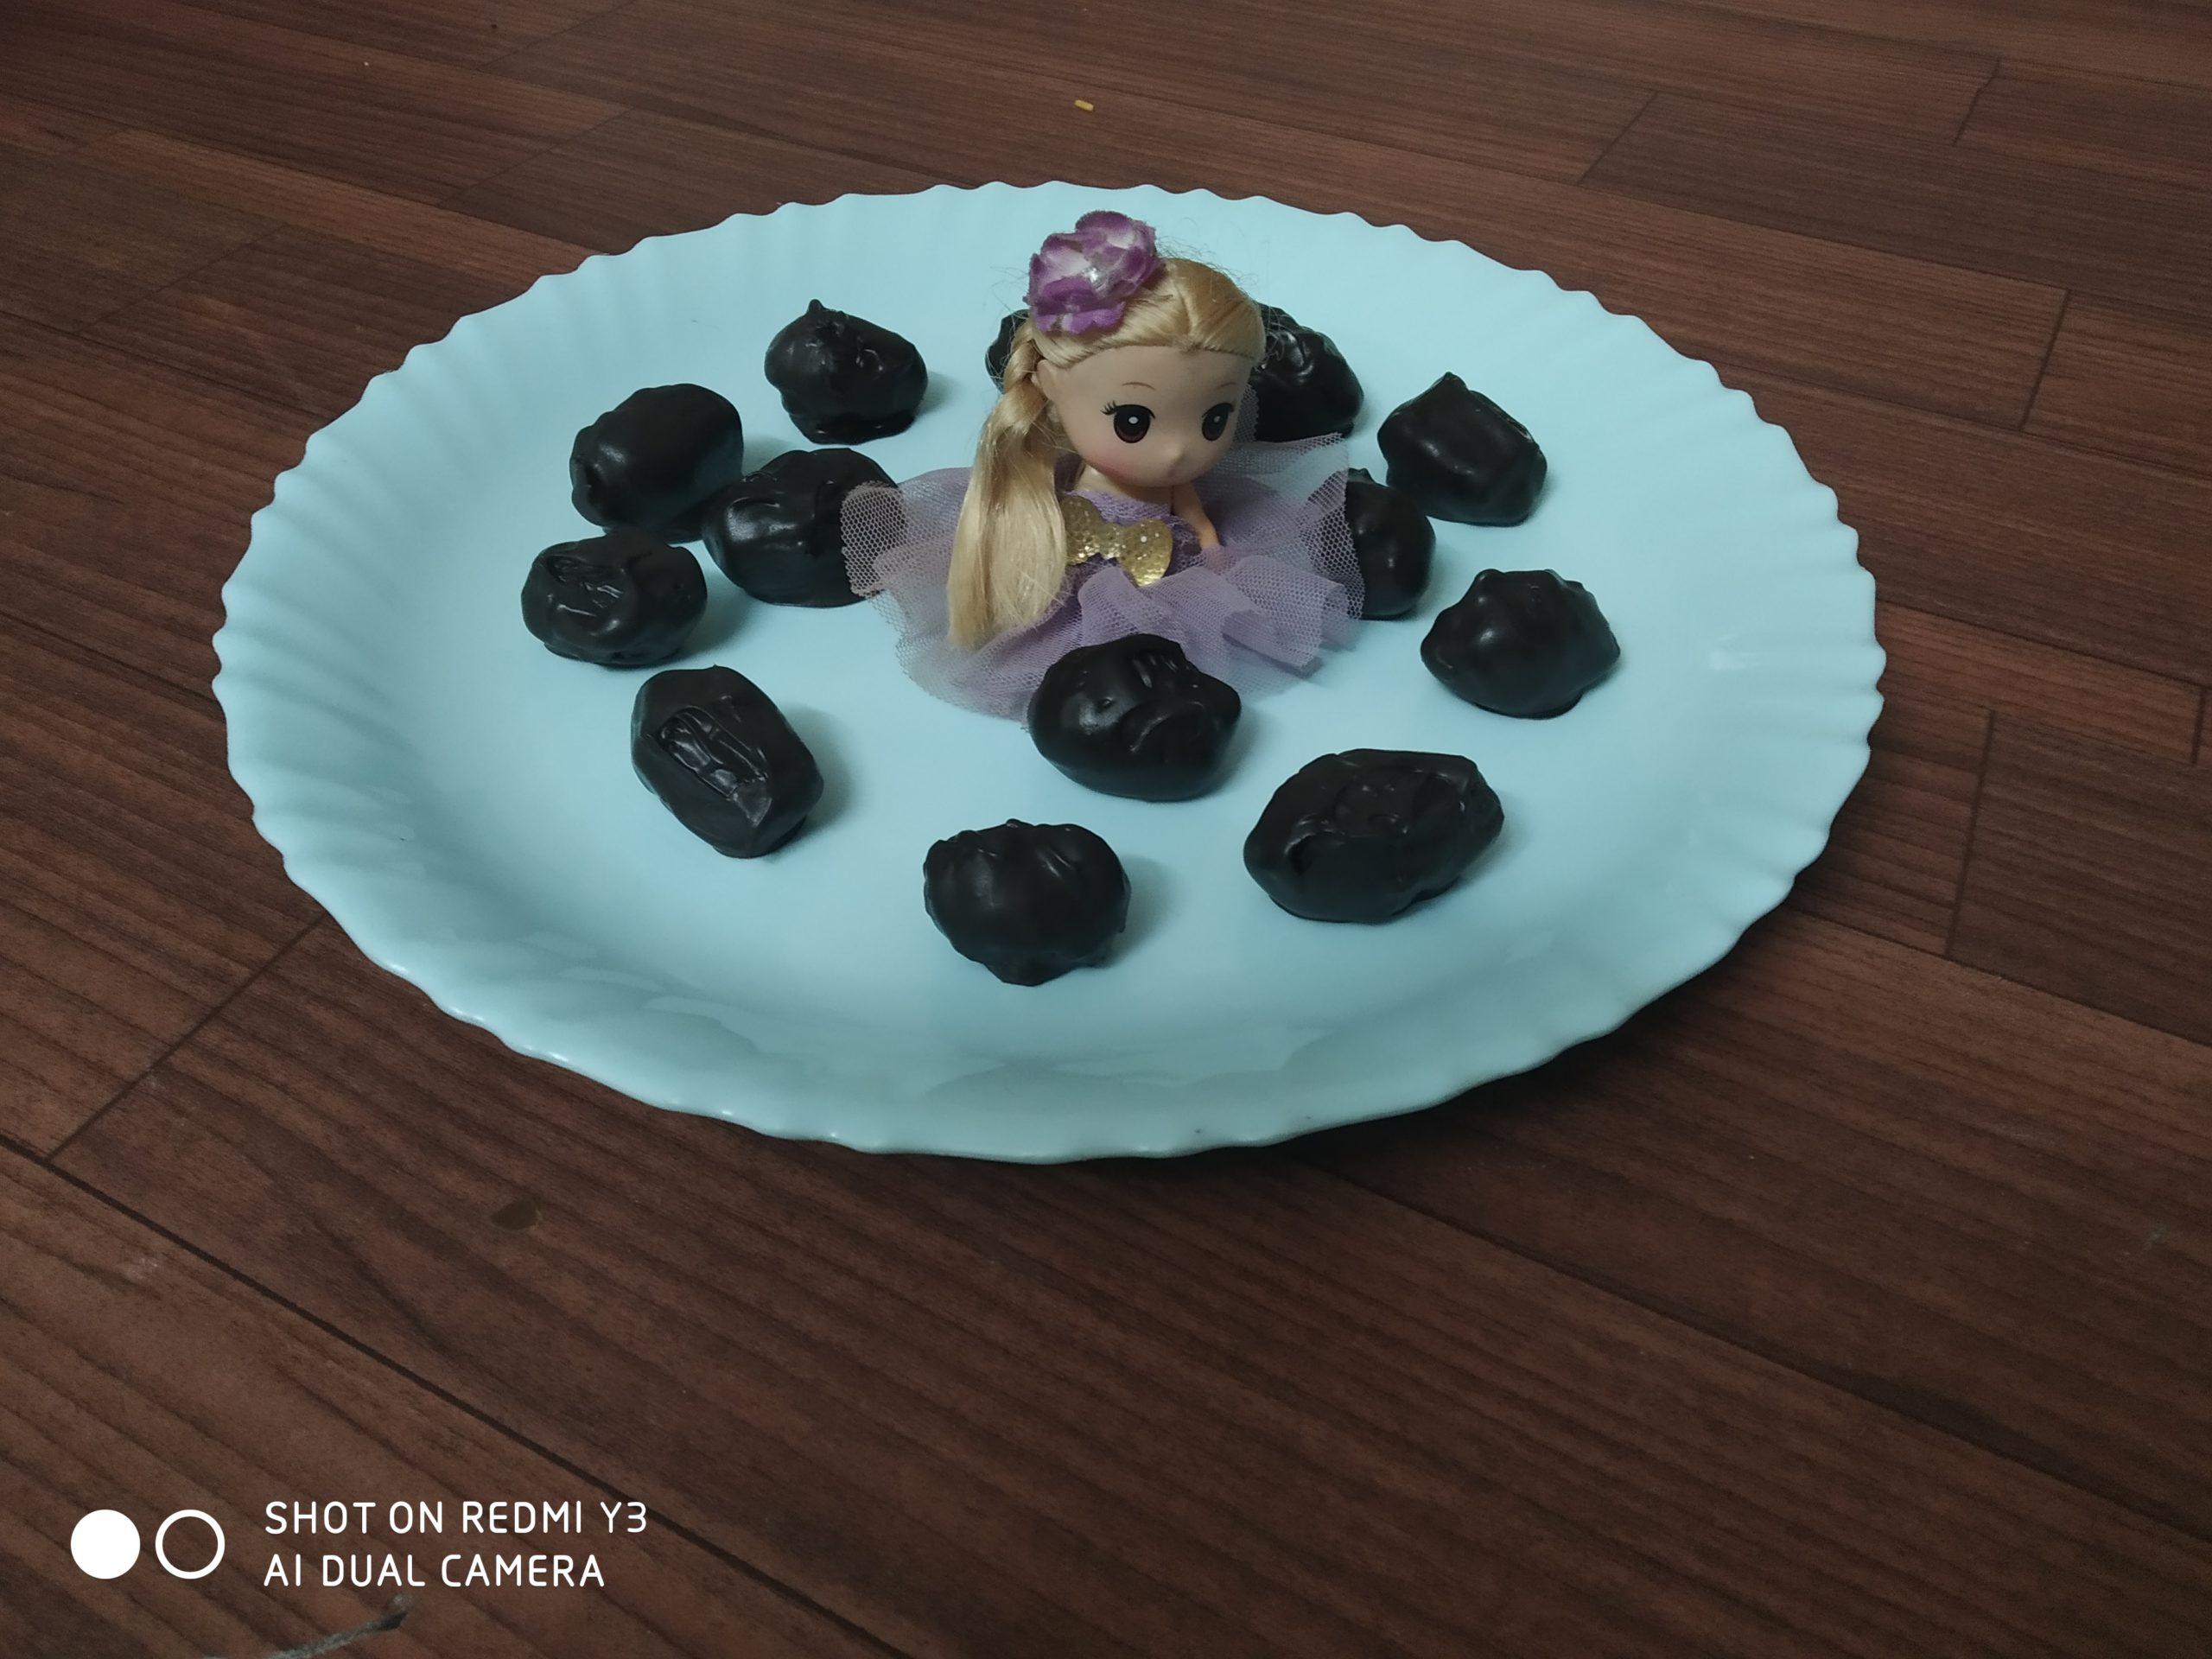 Chocolates 1kg Designs, Images, Price Near Me